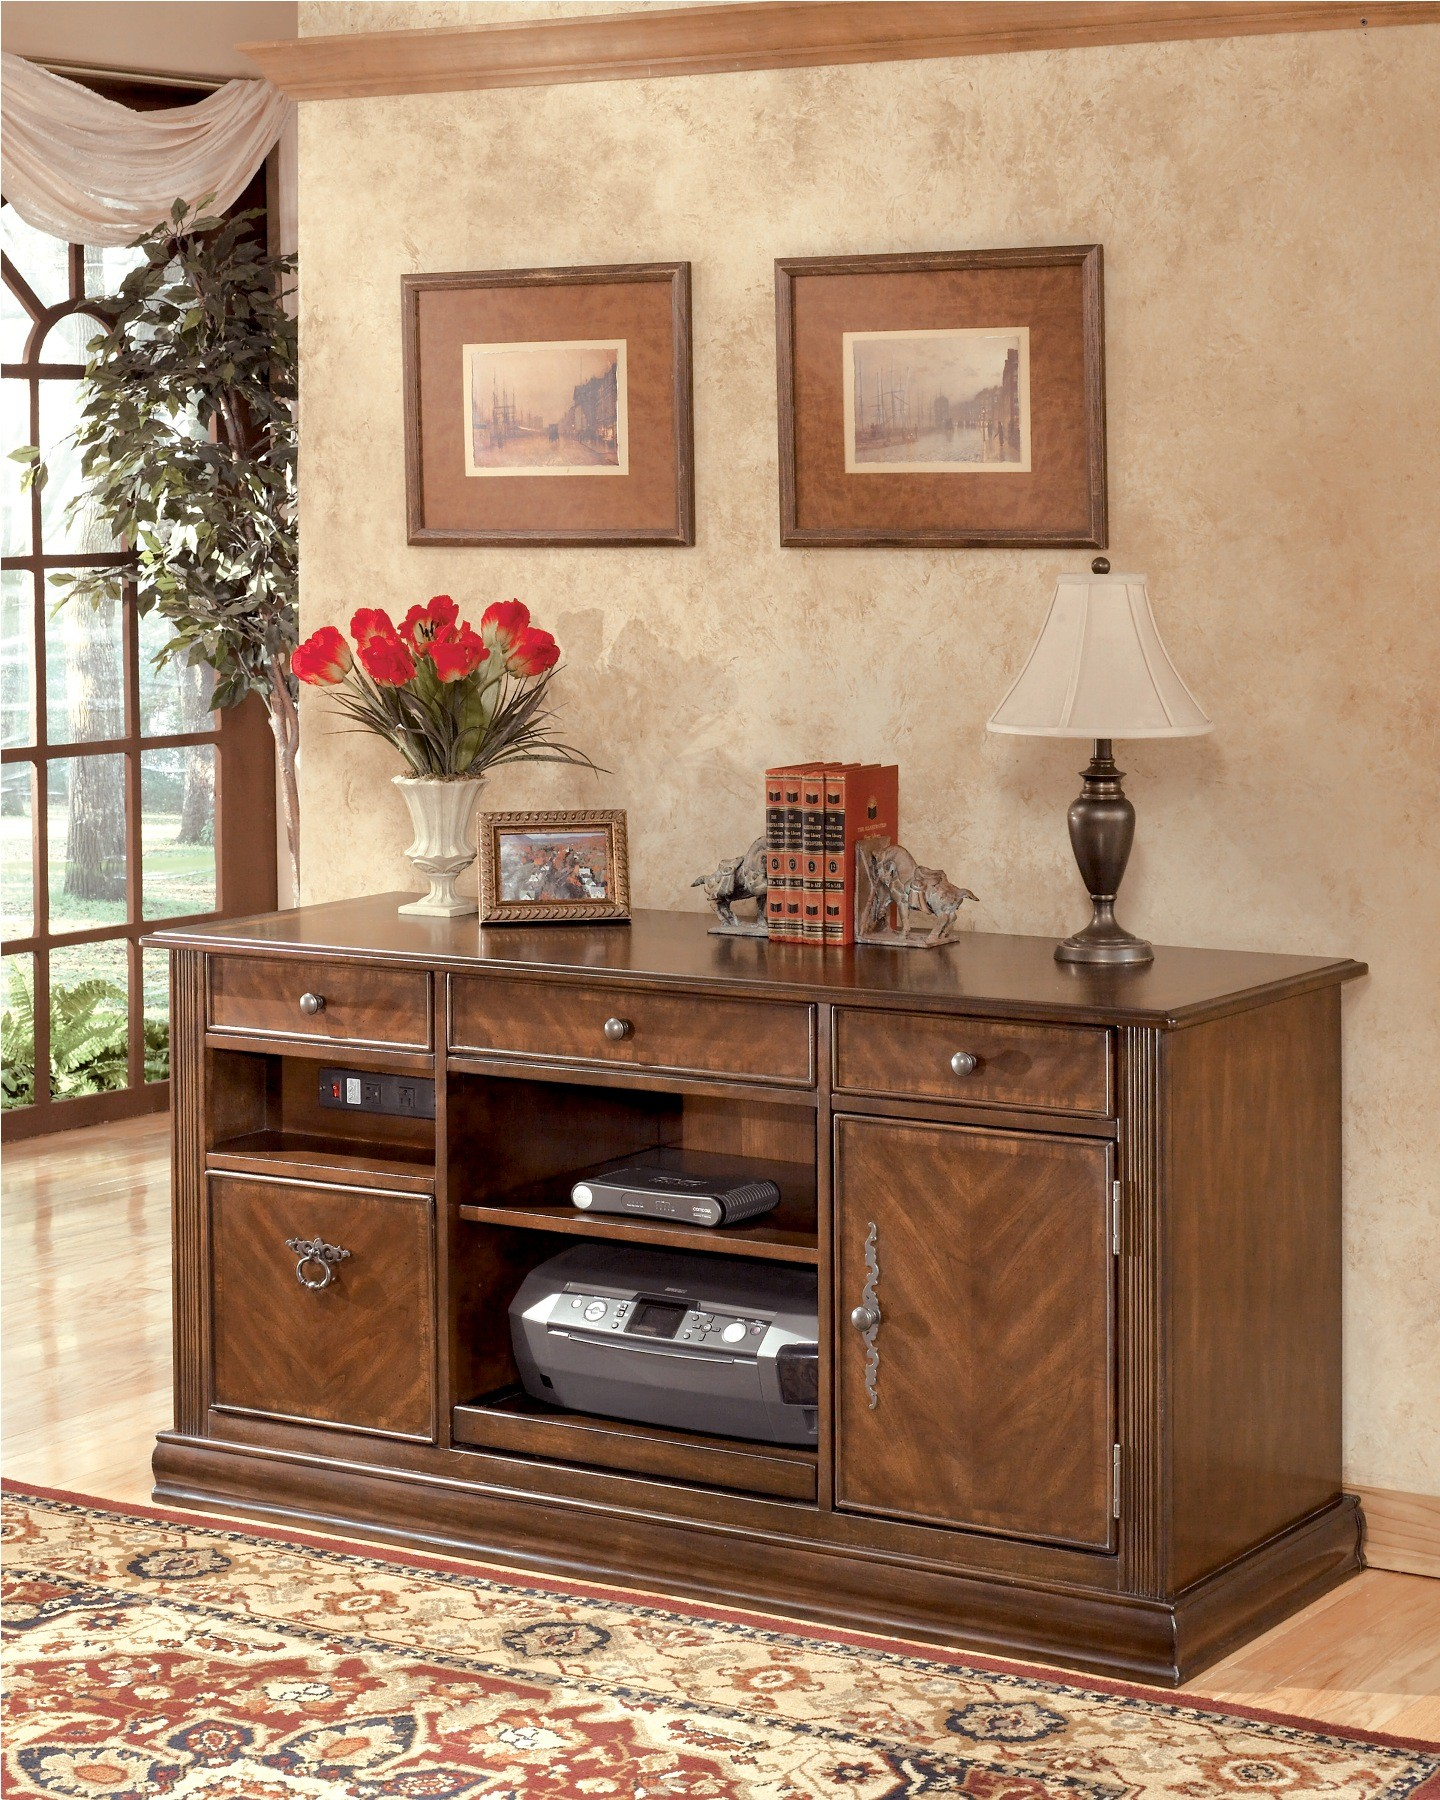 Ashley Furniture Bloomington Illinois Photos Reviews: Hamlyn Large Credenza From Ashley (H527-46)